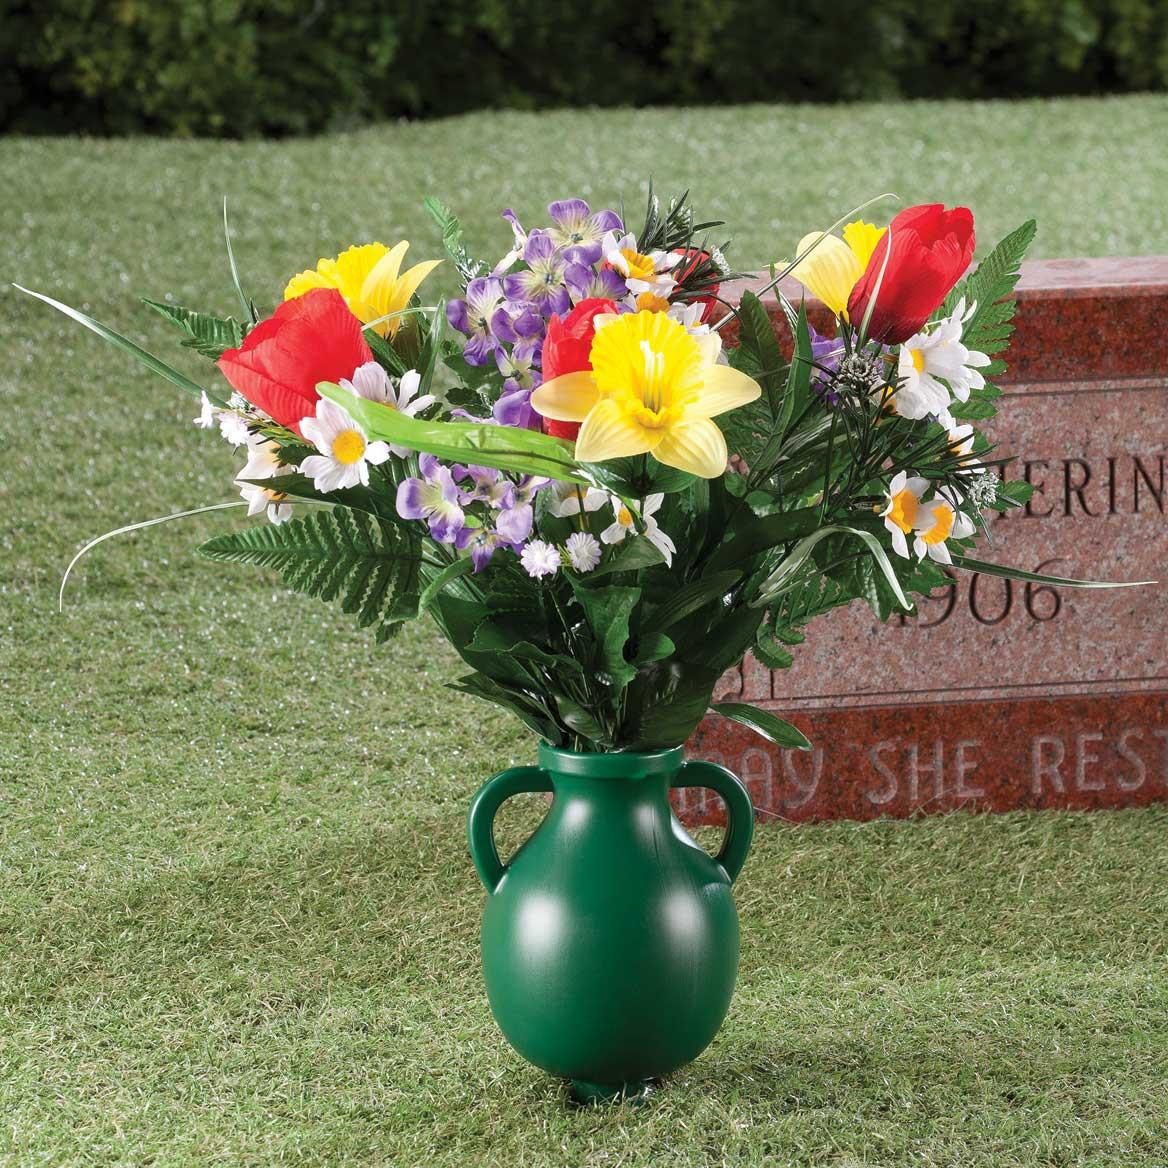 aluminium grave vase insert of outdoor sale walter drake with garden cemetery vase 359808 garden cemetery vase 359808